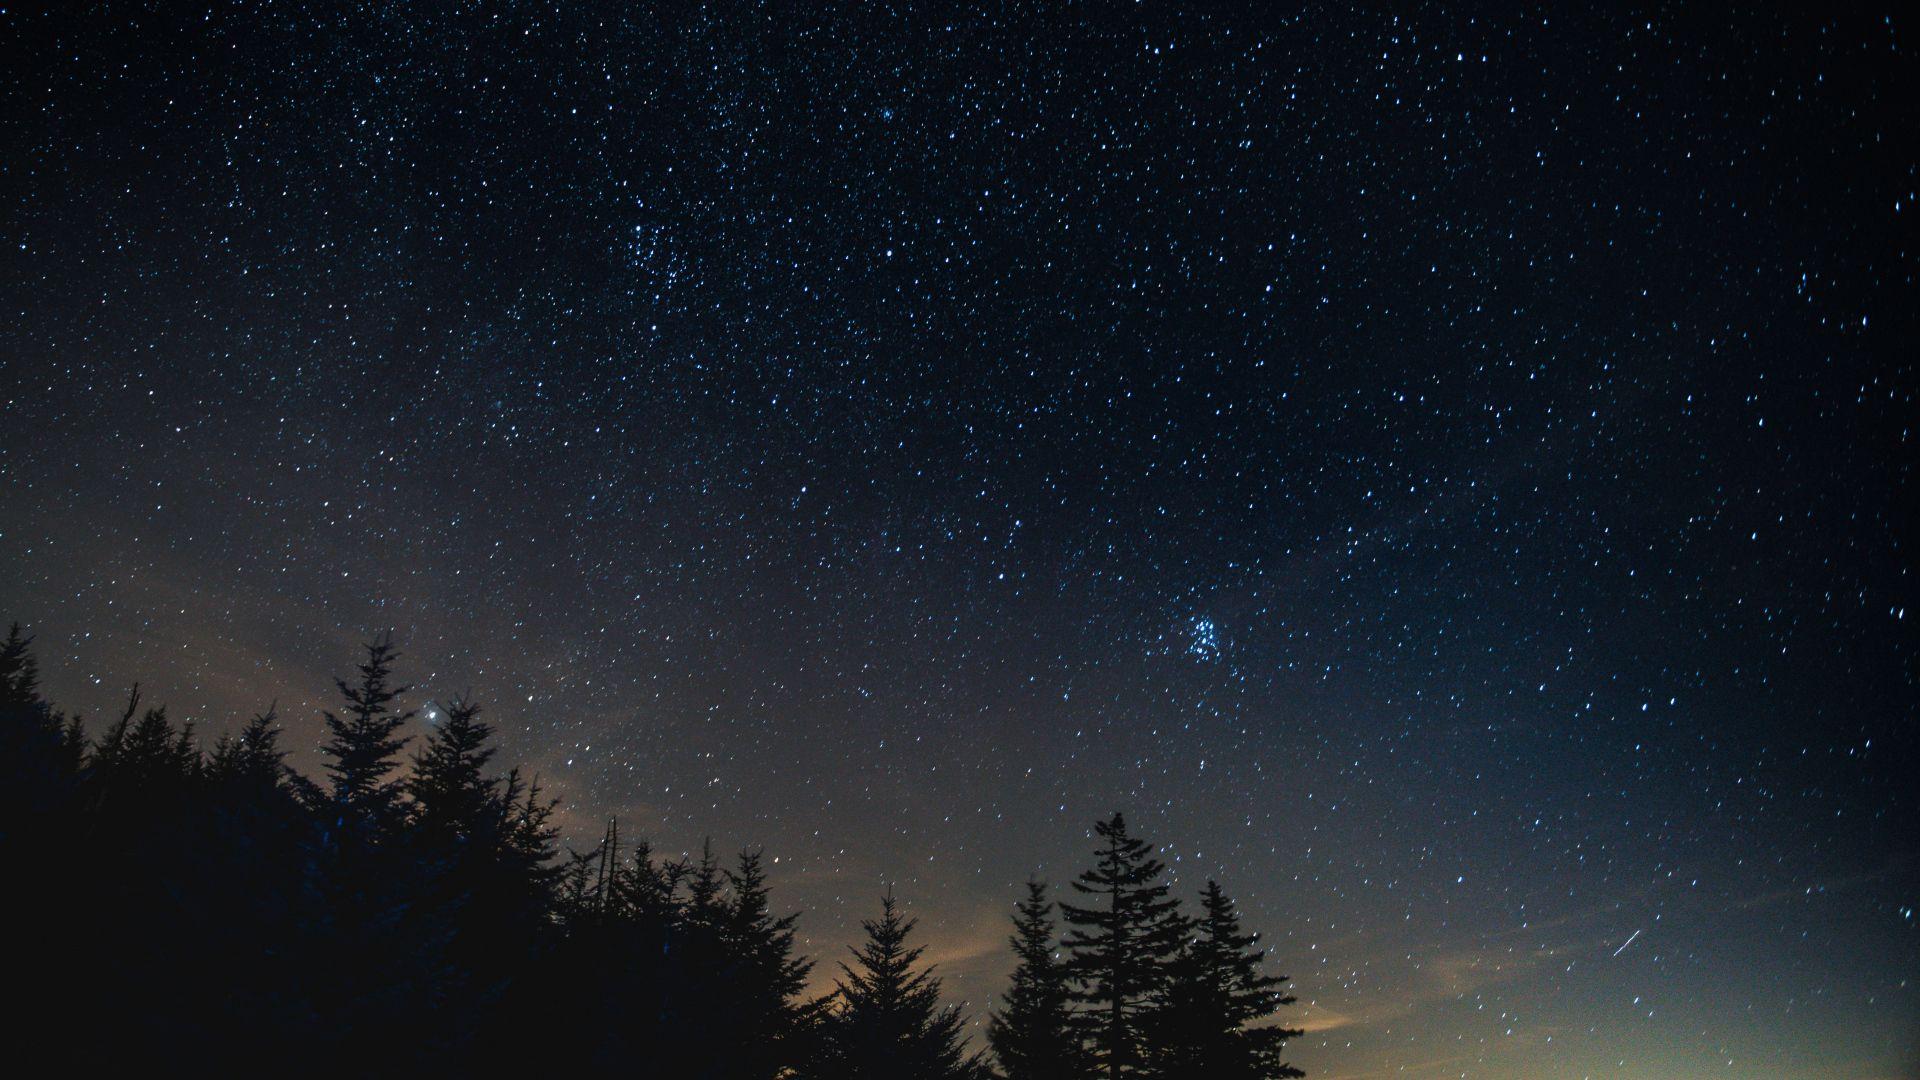 1920x1080 Wallpaper starry sky, night, trees, night